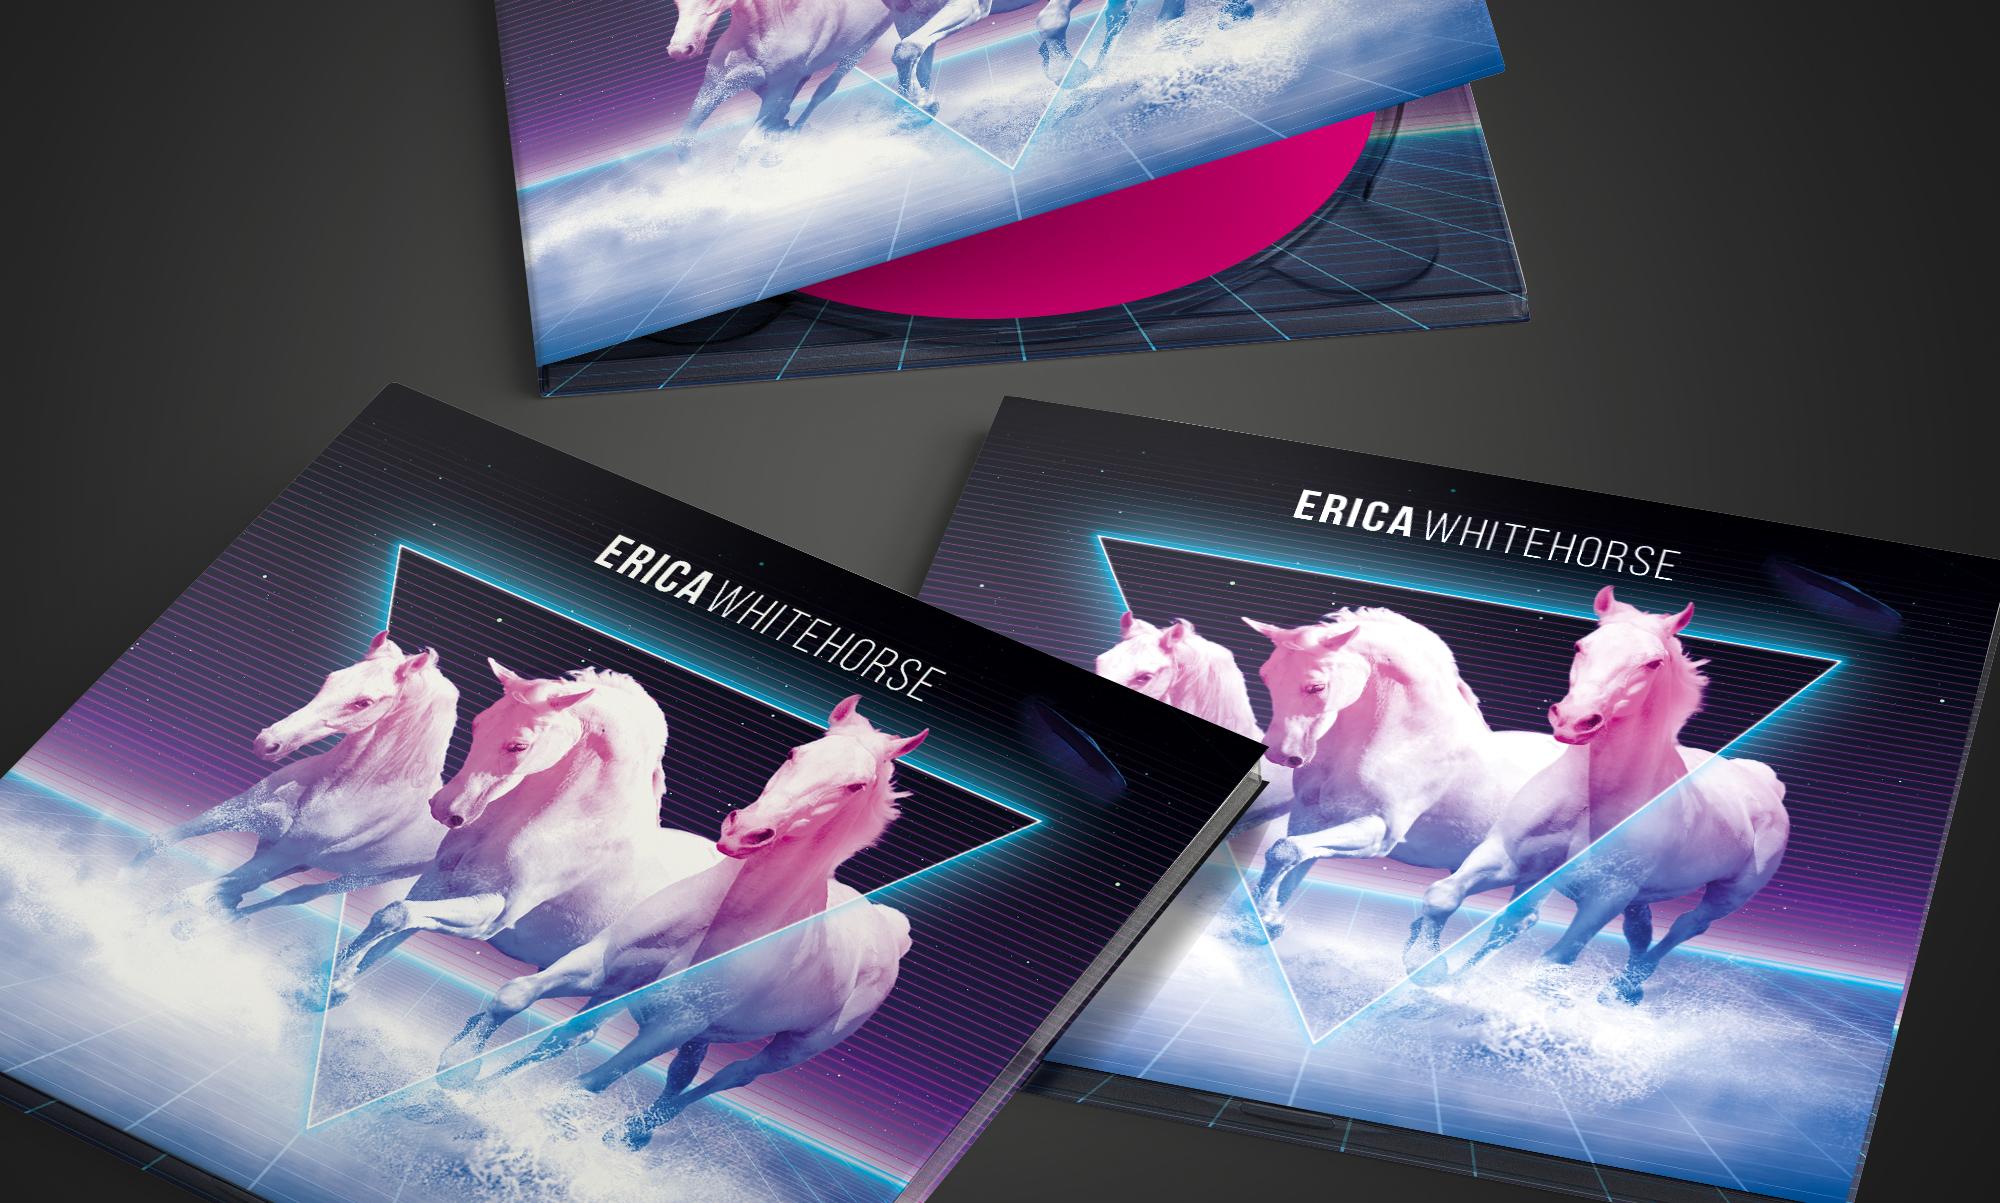 Band Album Artwork Design